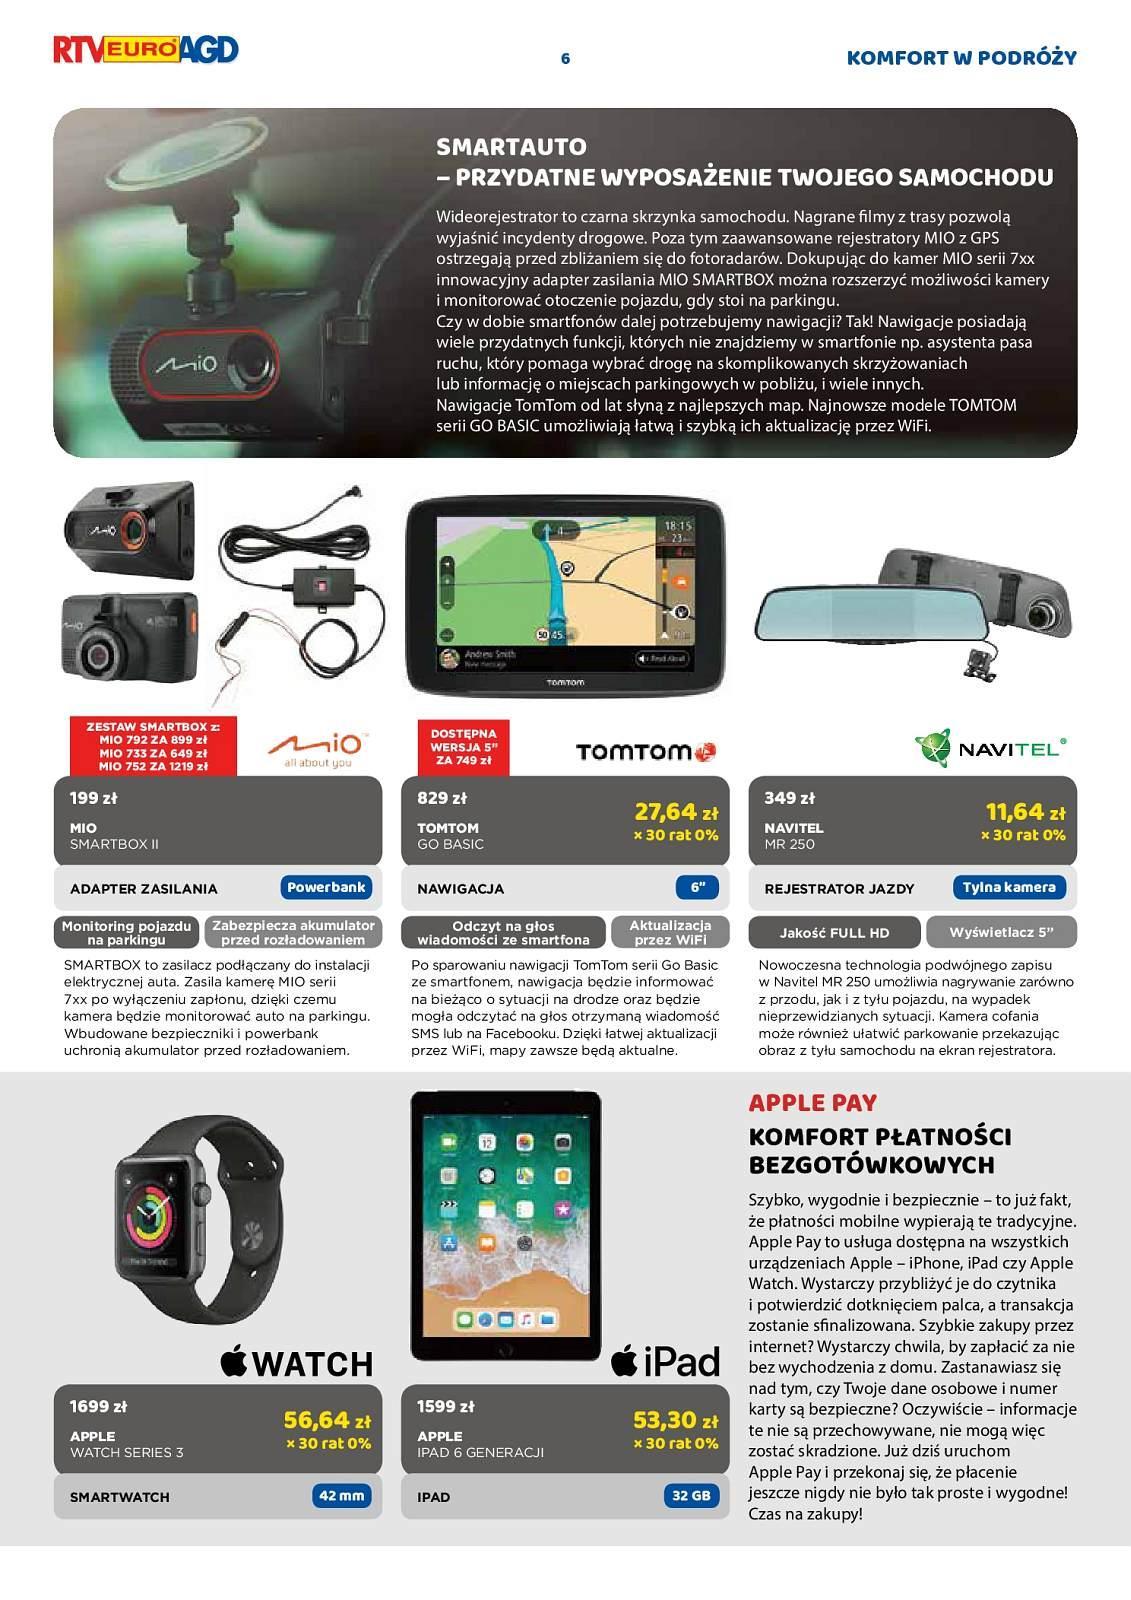 Gazetka promocyjna RTV Euro AGD do 01/10/2018 str.5